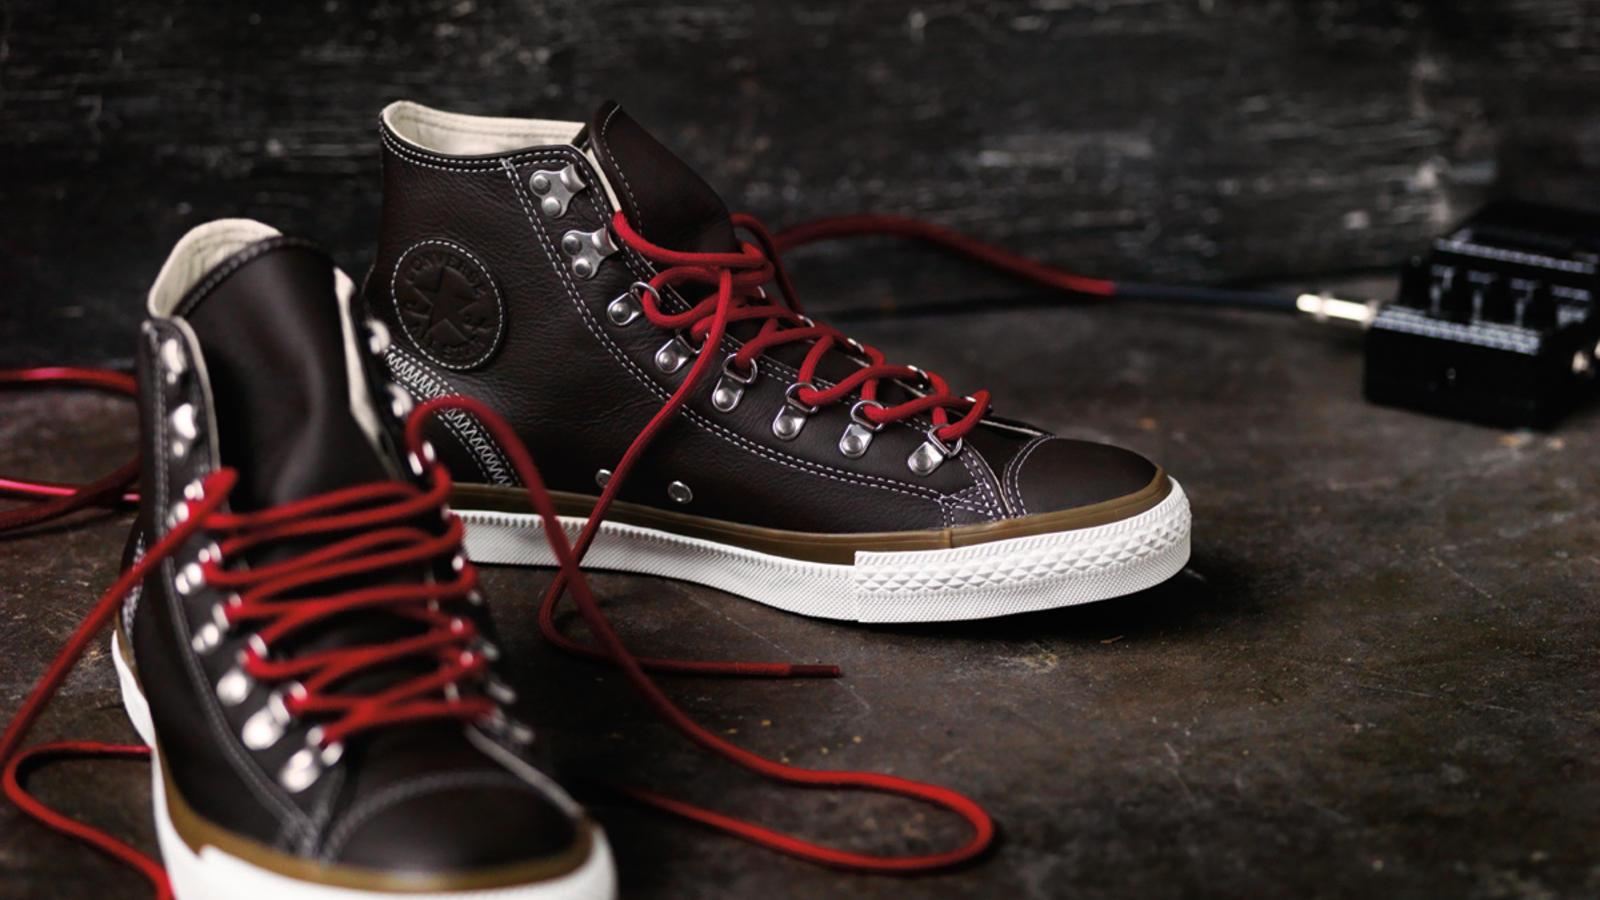 201bd9c0244253 Converse Announces Fall 2012 Chuck Taylor All Star Footwear ...